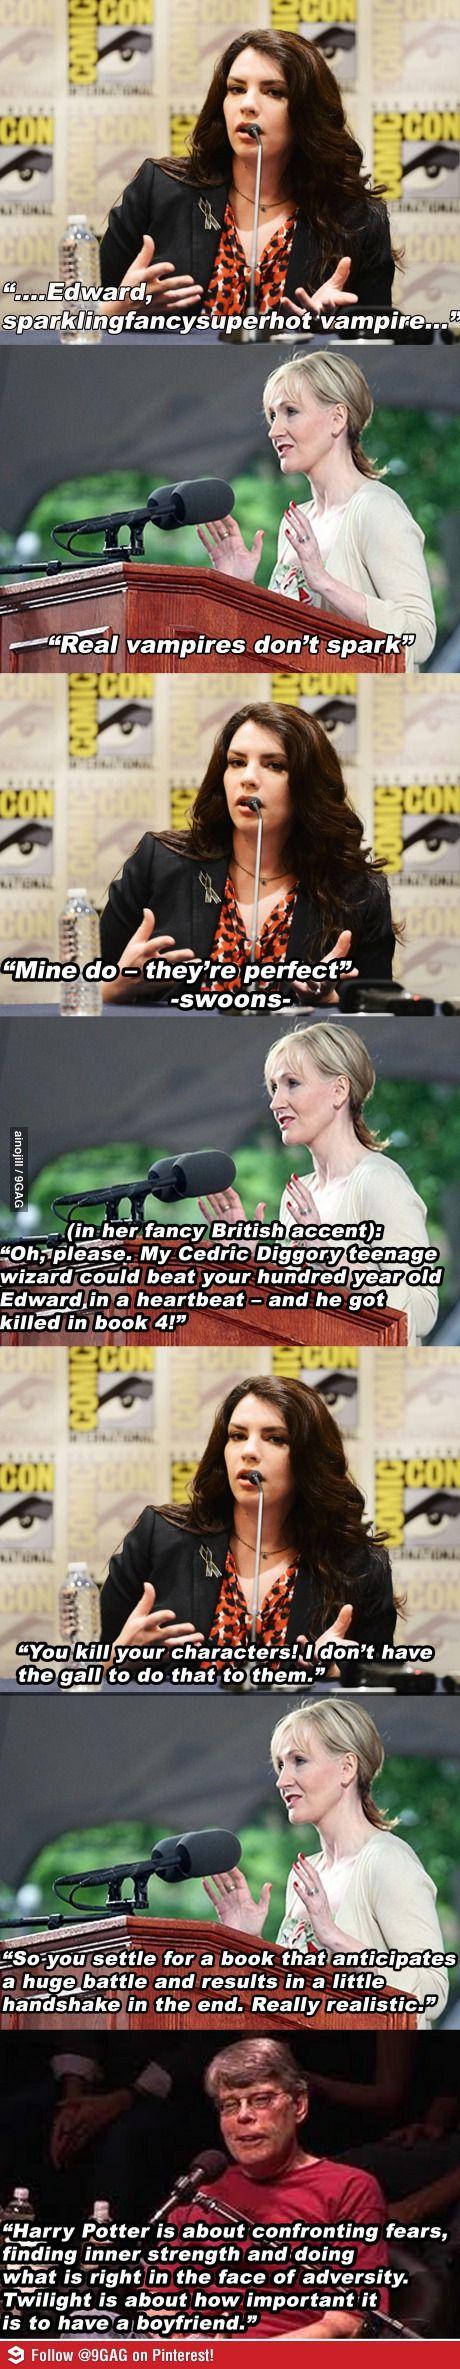 Harry Potter vs Twilight.